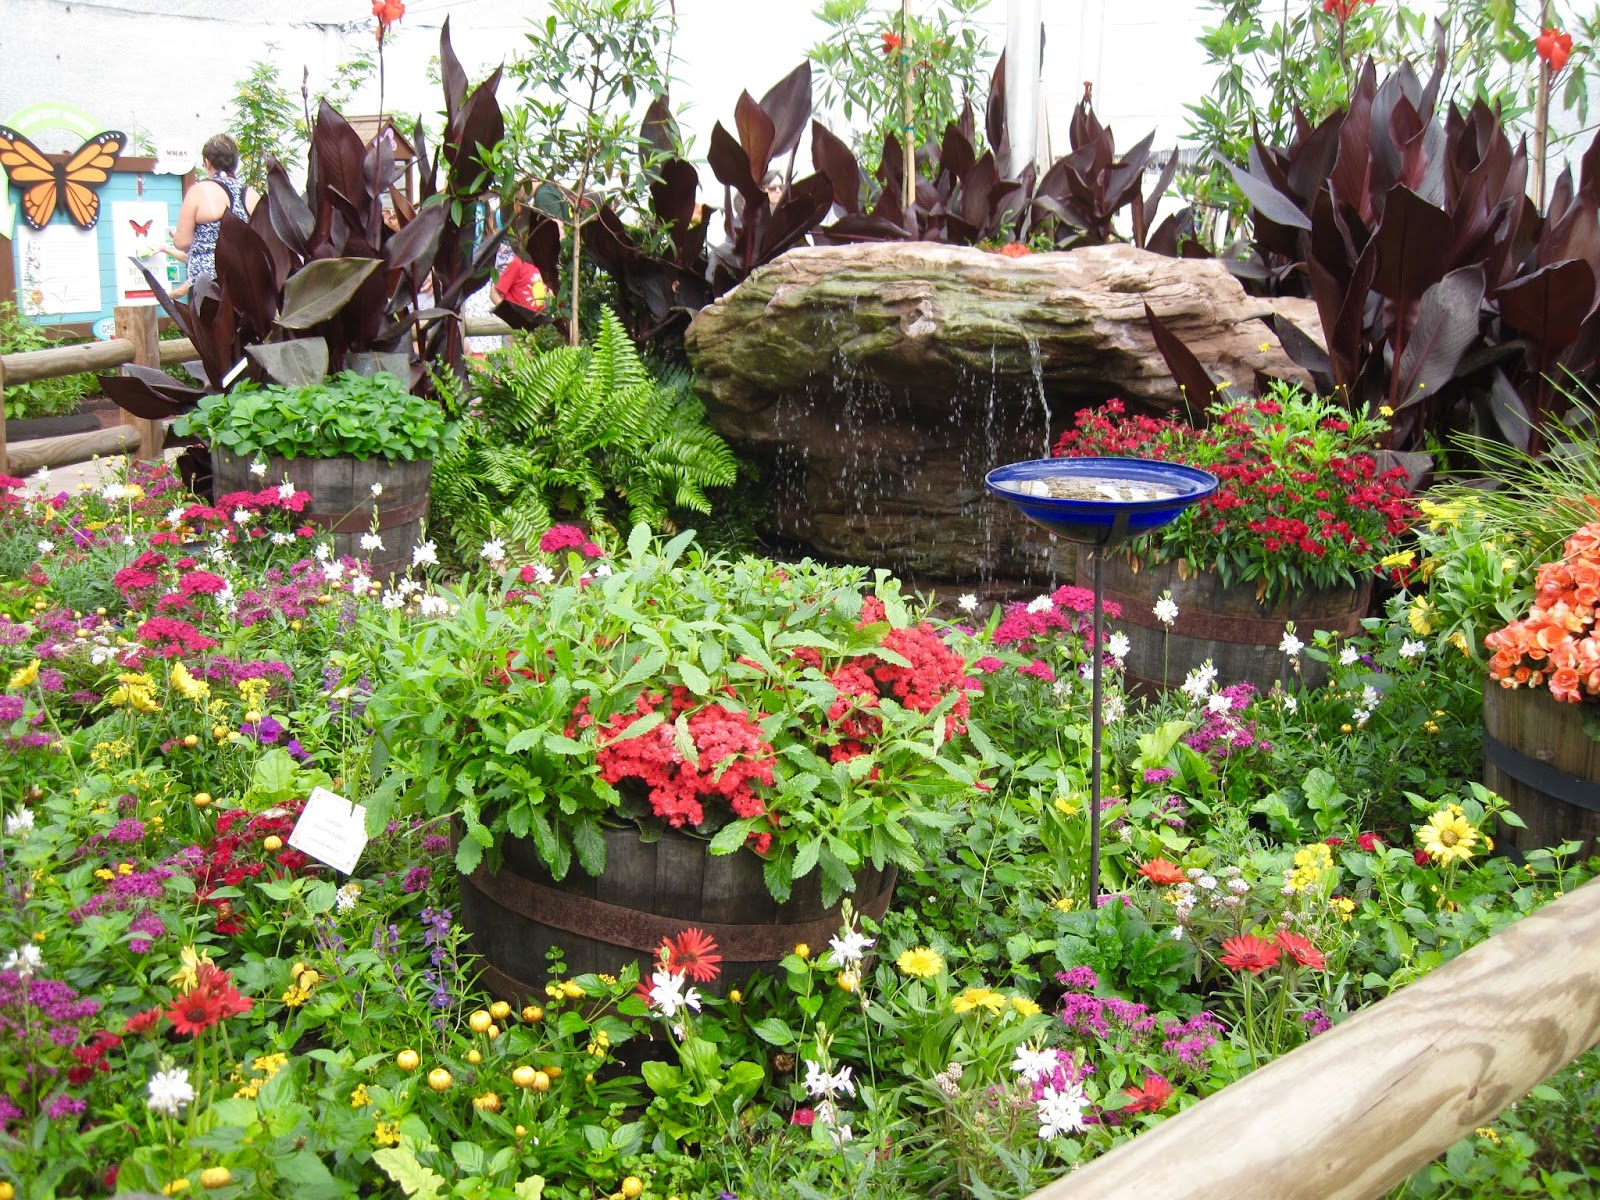 bonney lassie: butterfly garden at the epcot international flower